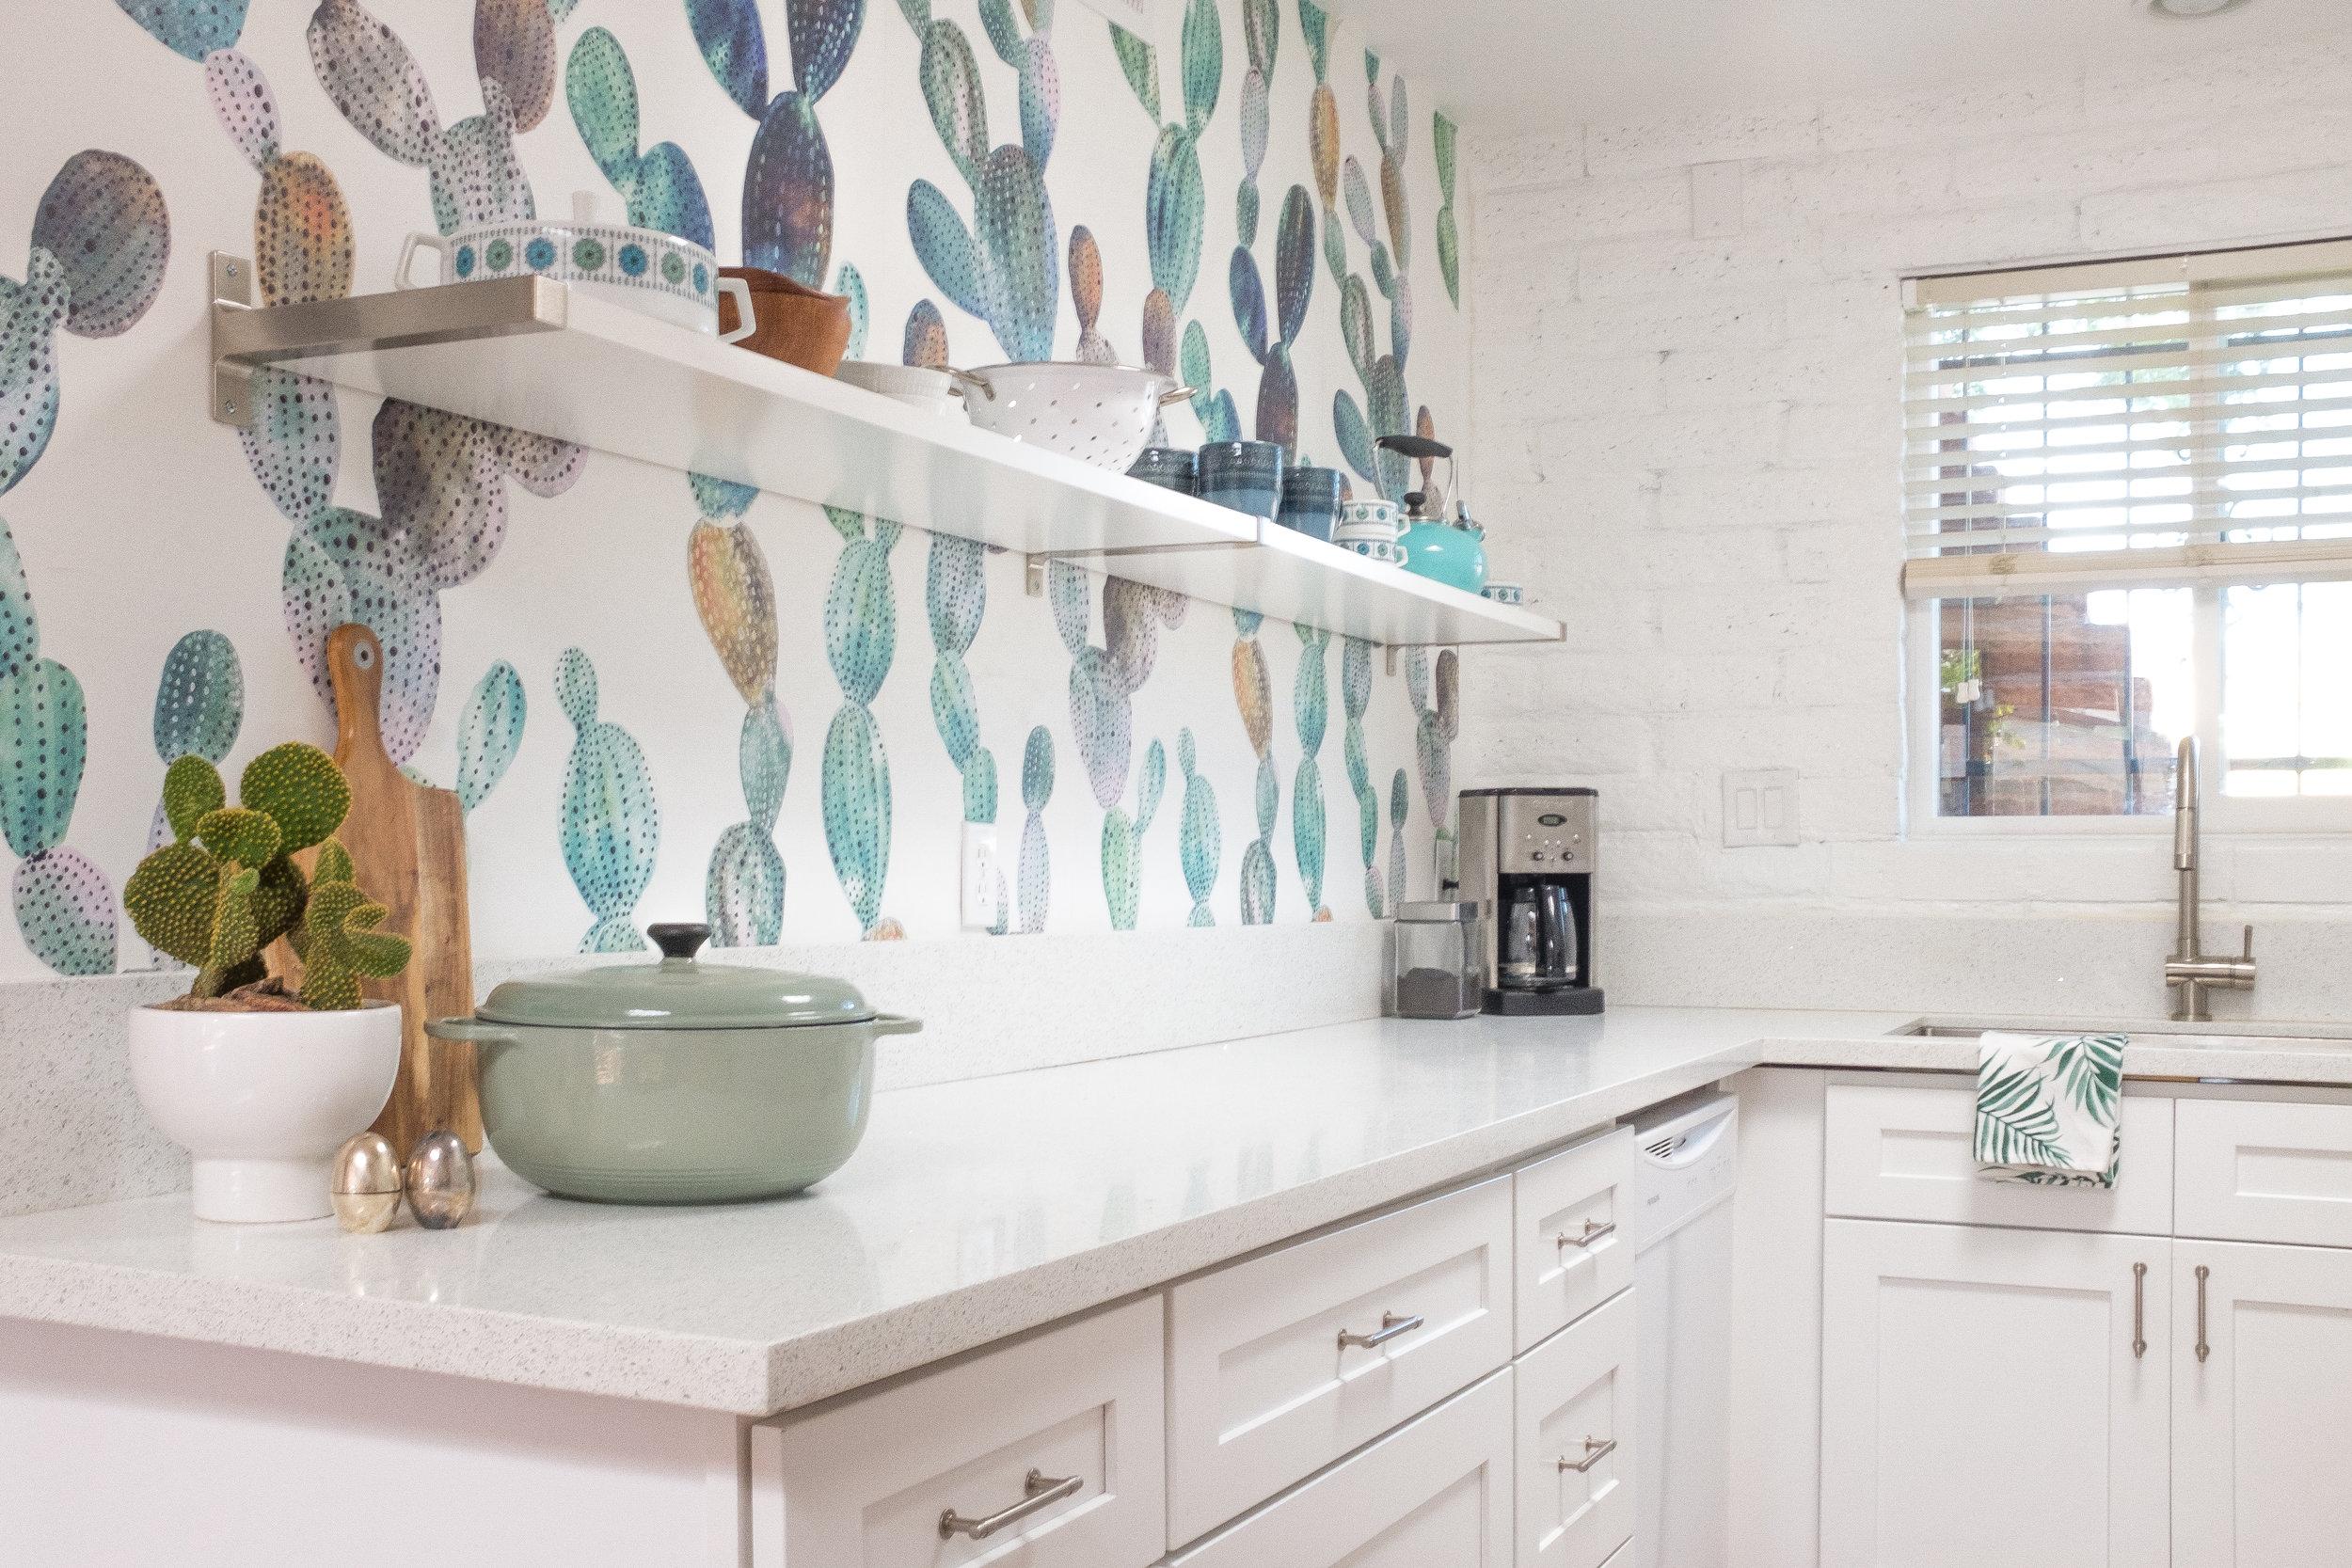 Cozy Cactus Kitchen Shelves.jpg